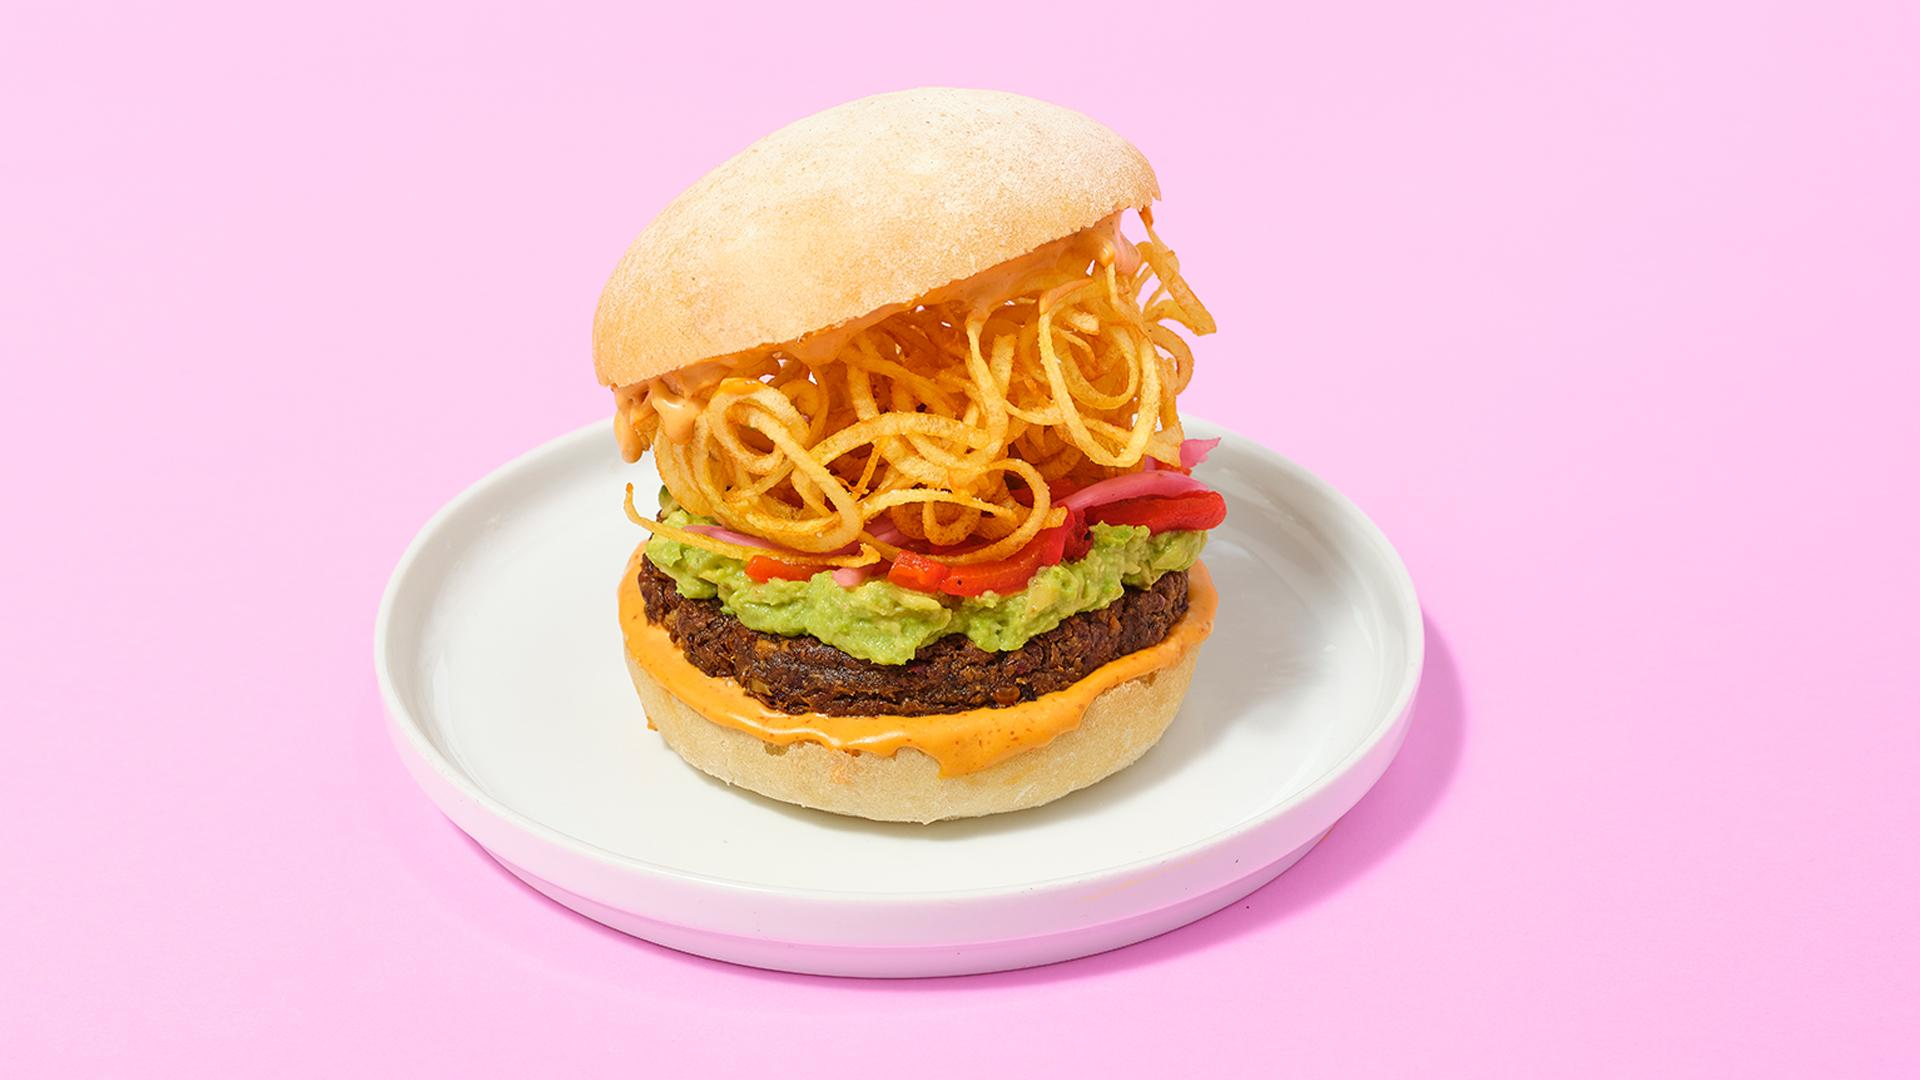 SweetChops Big Chops burger | Best veggie burgers in Toronto